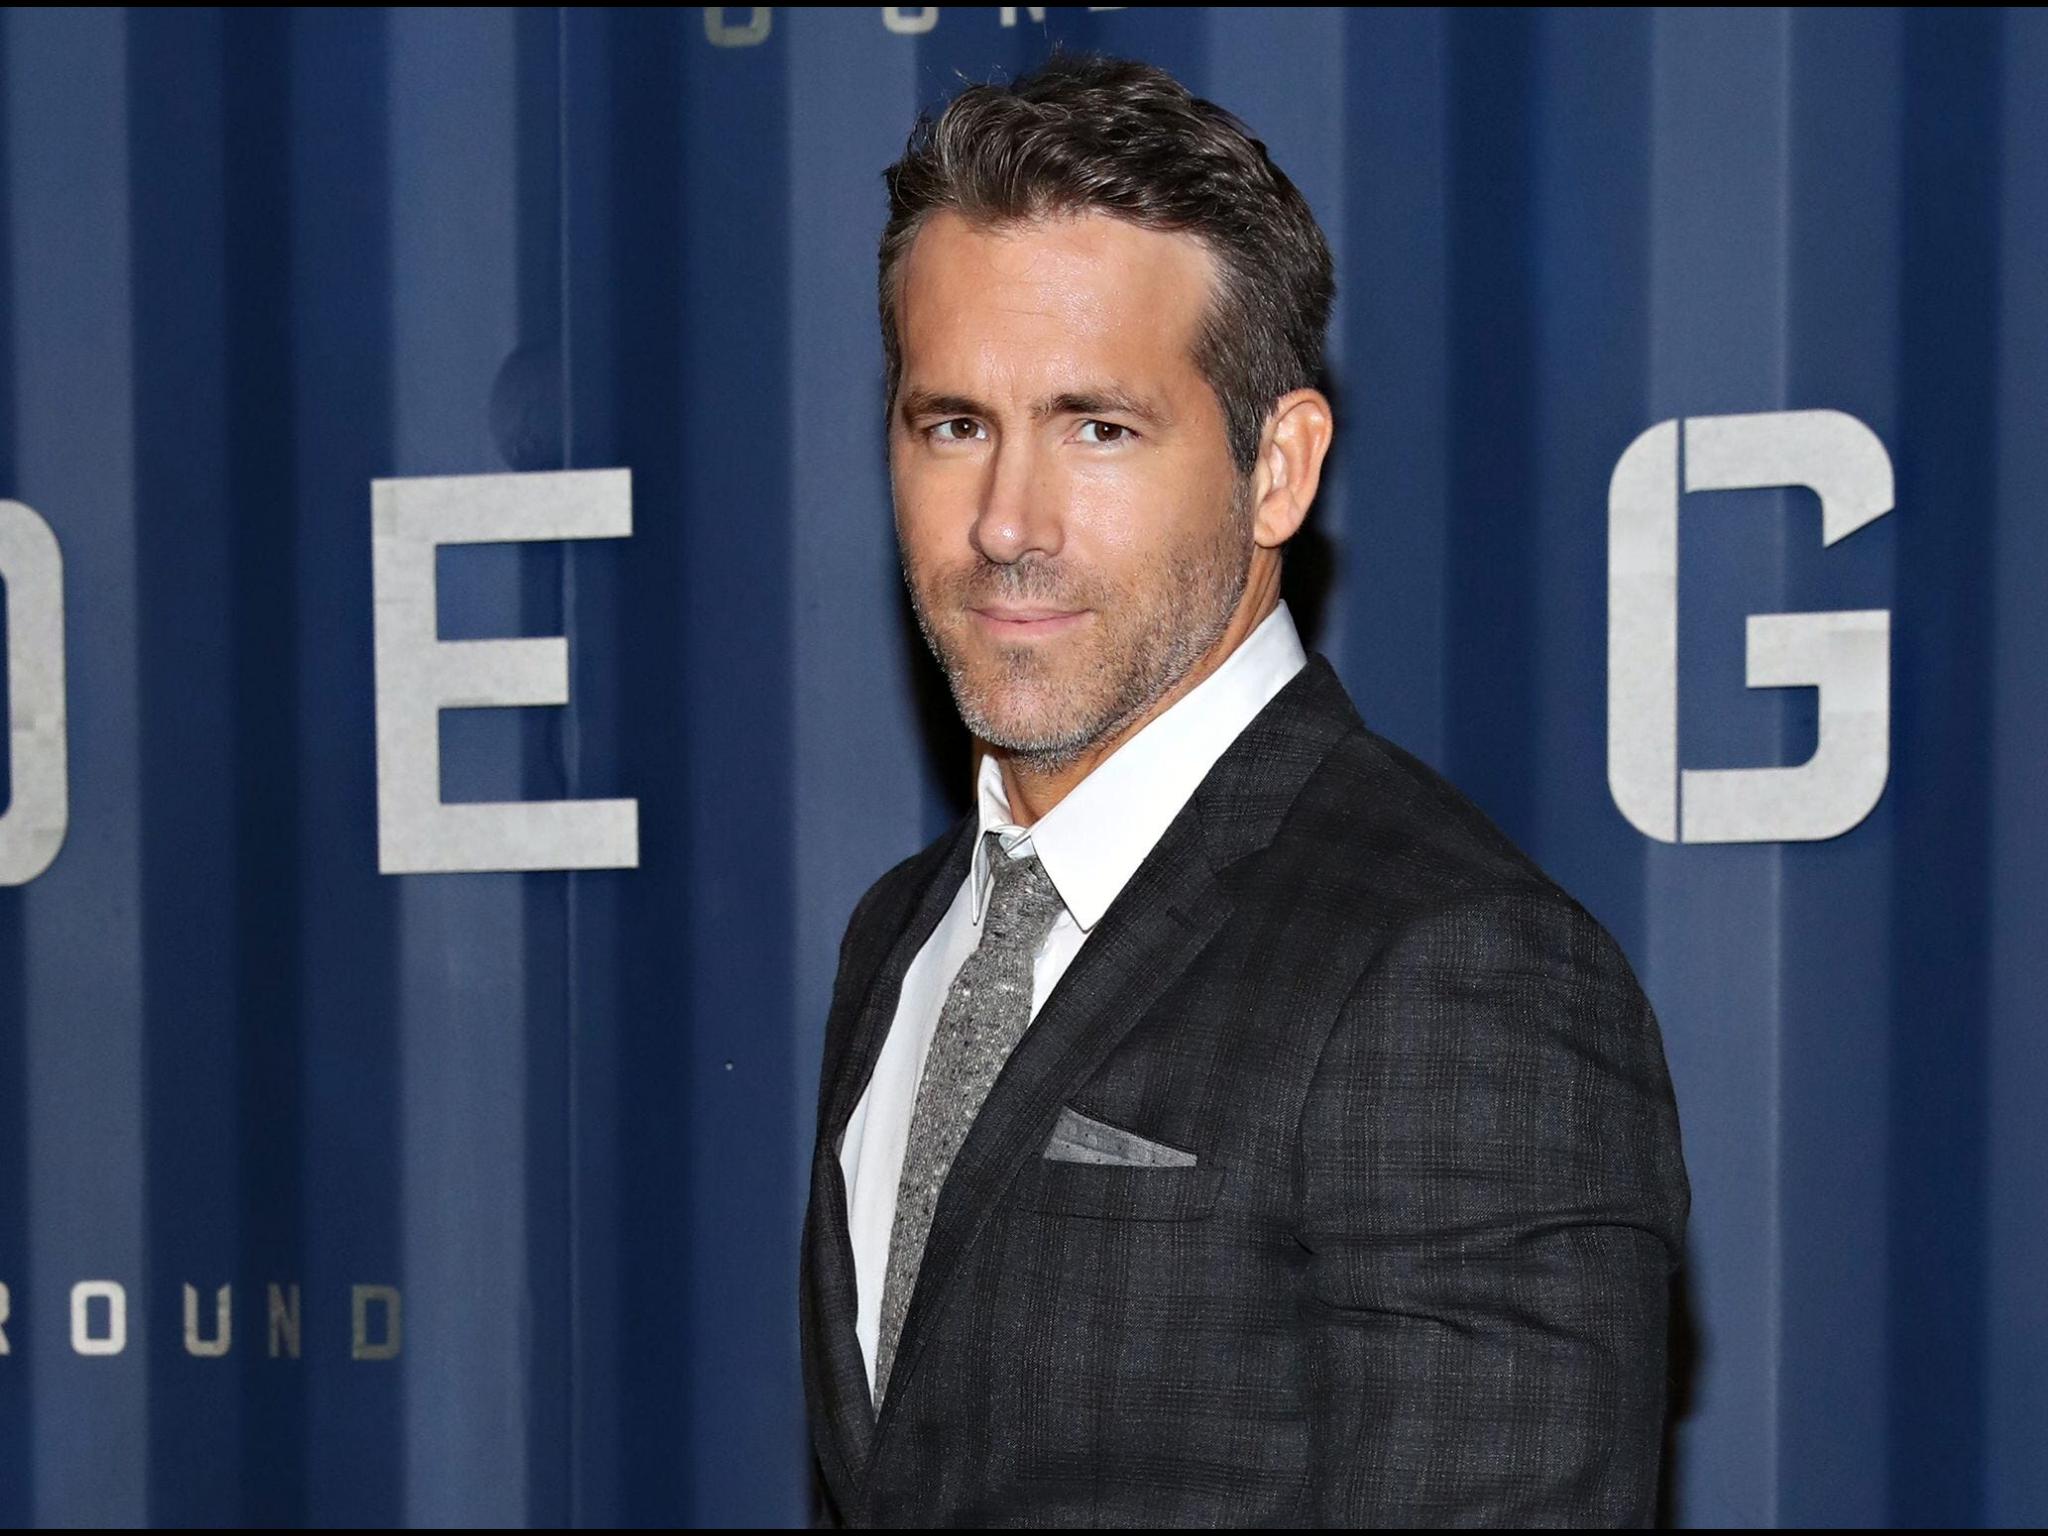 Pin By Mimi Smoments On Bellissima Ryan Reynolds Ryan Reynolds Movies Celebrity Entertainment